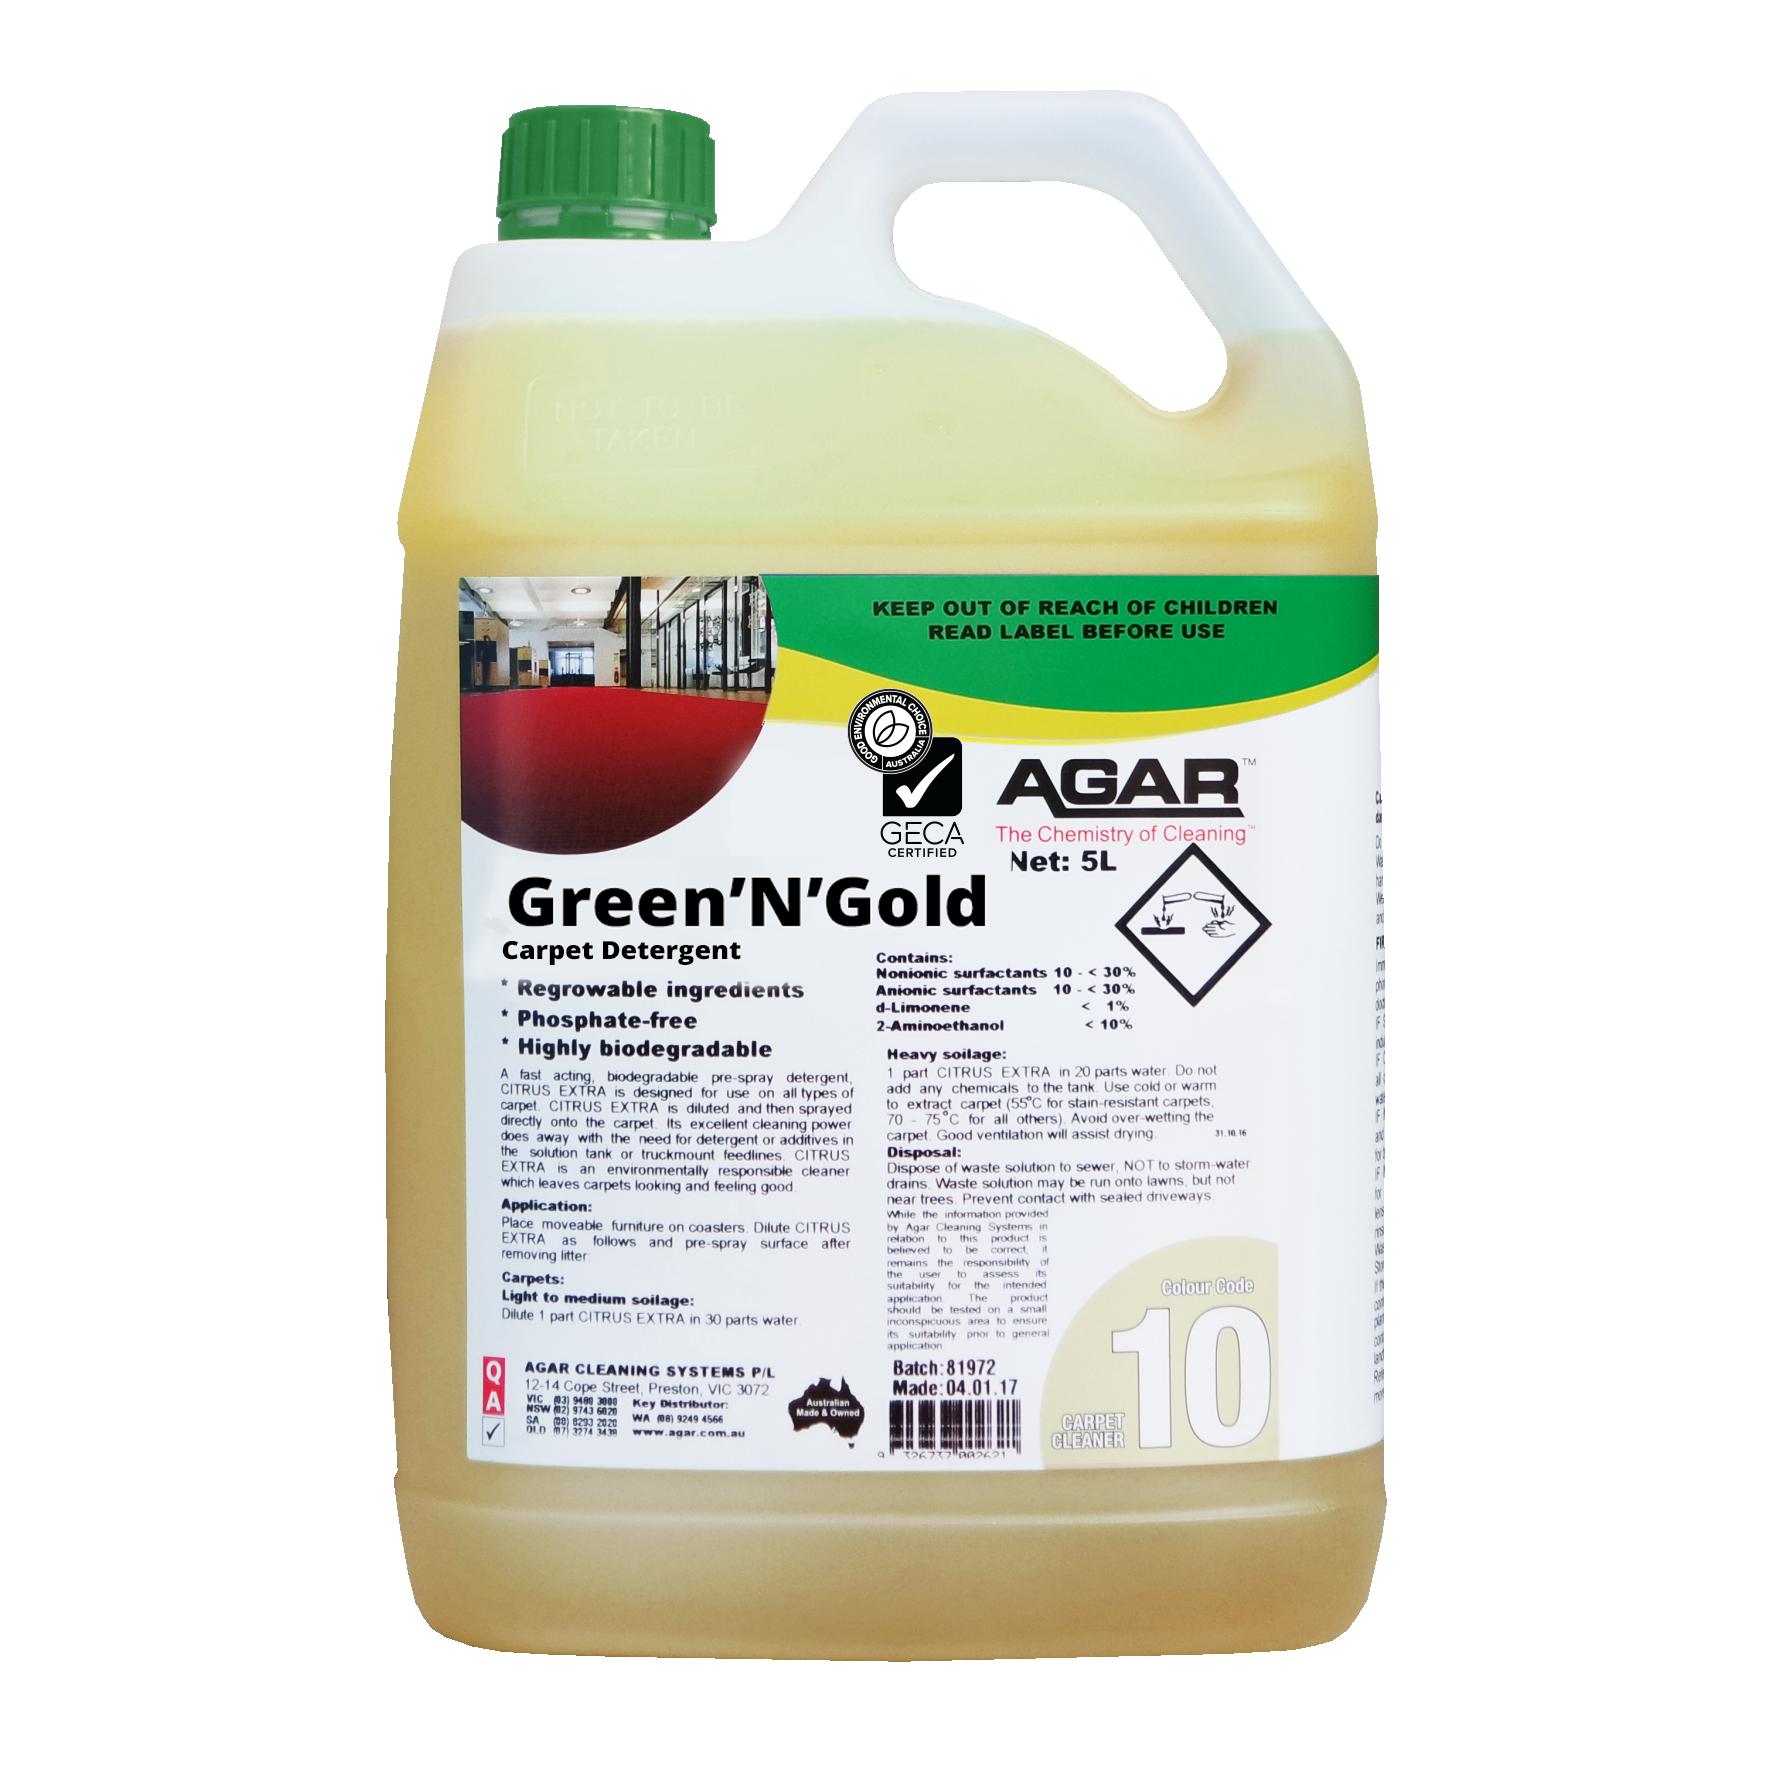 Green'N'Gold Carpet Detergent